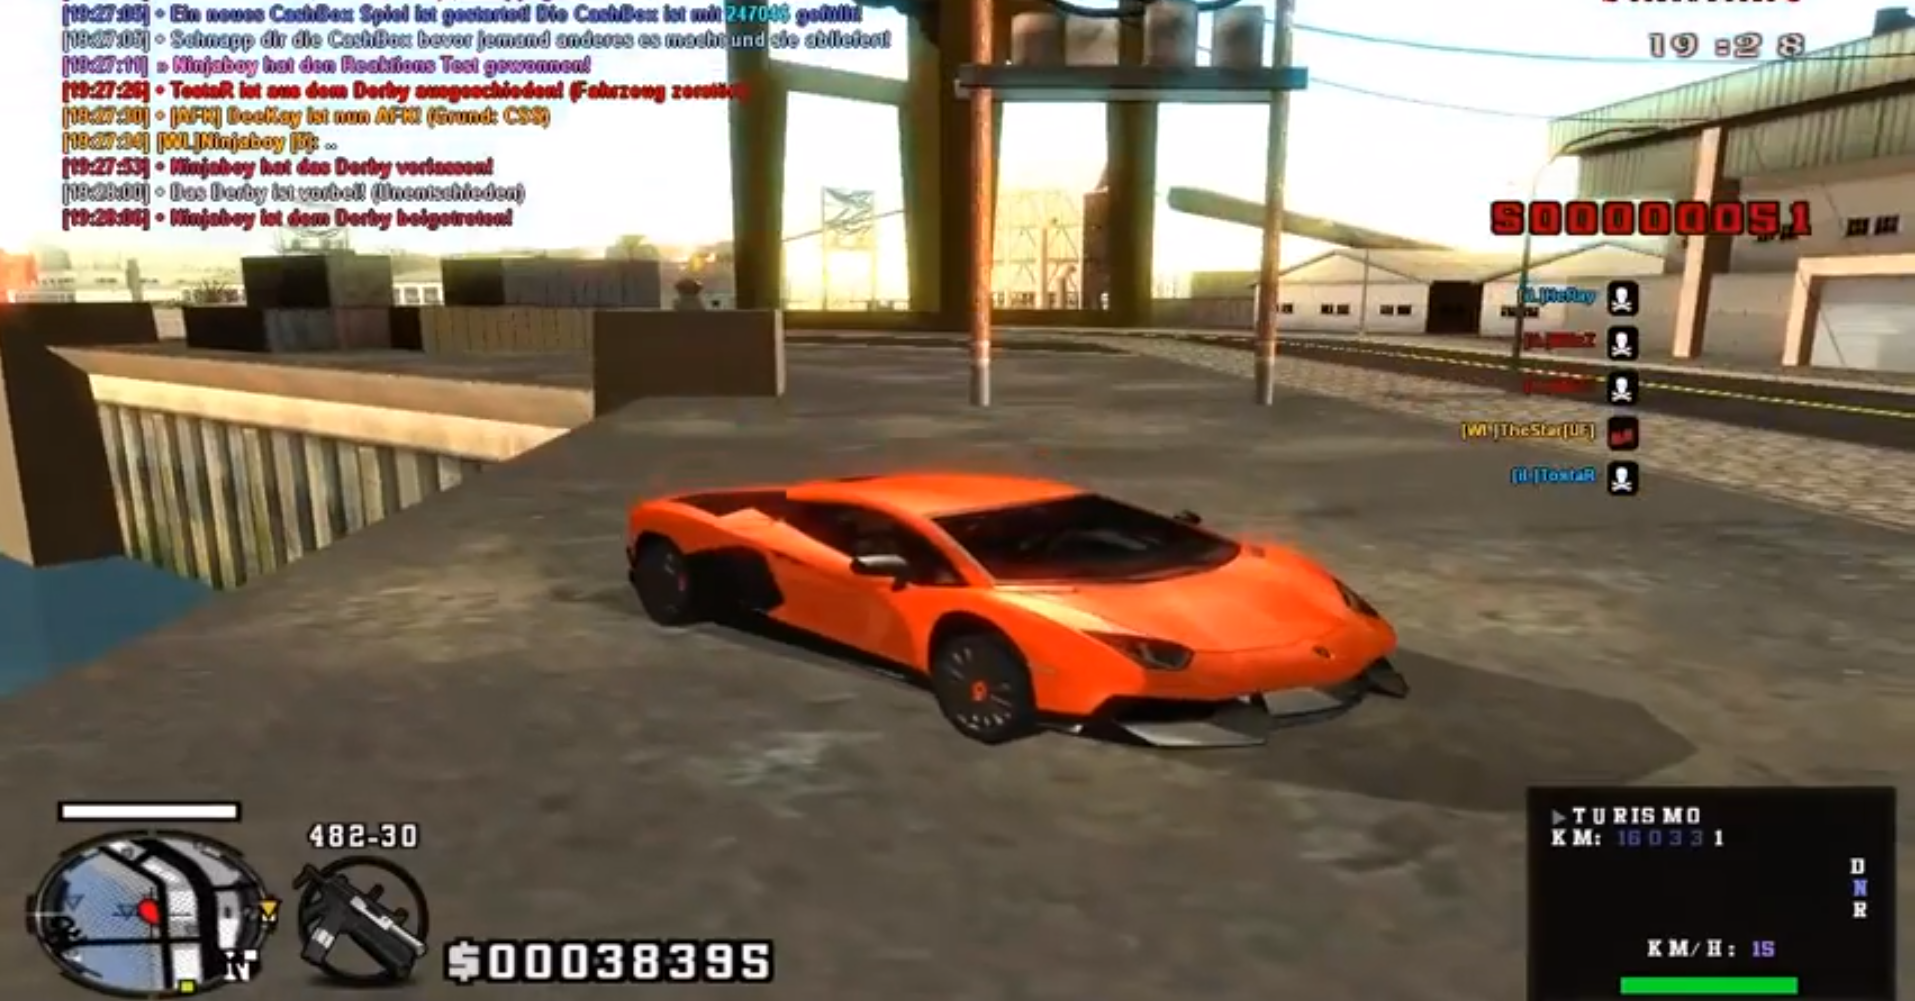 Tuned Aventador in GTA San Andreas - autoevolution